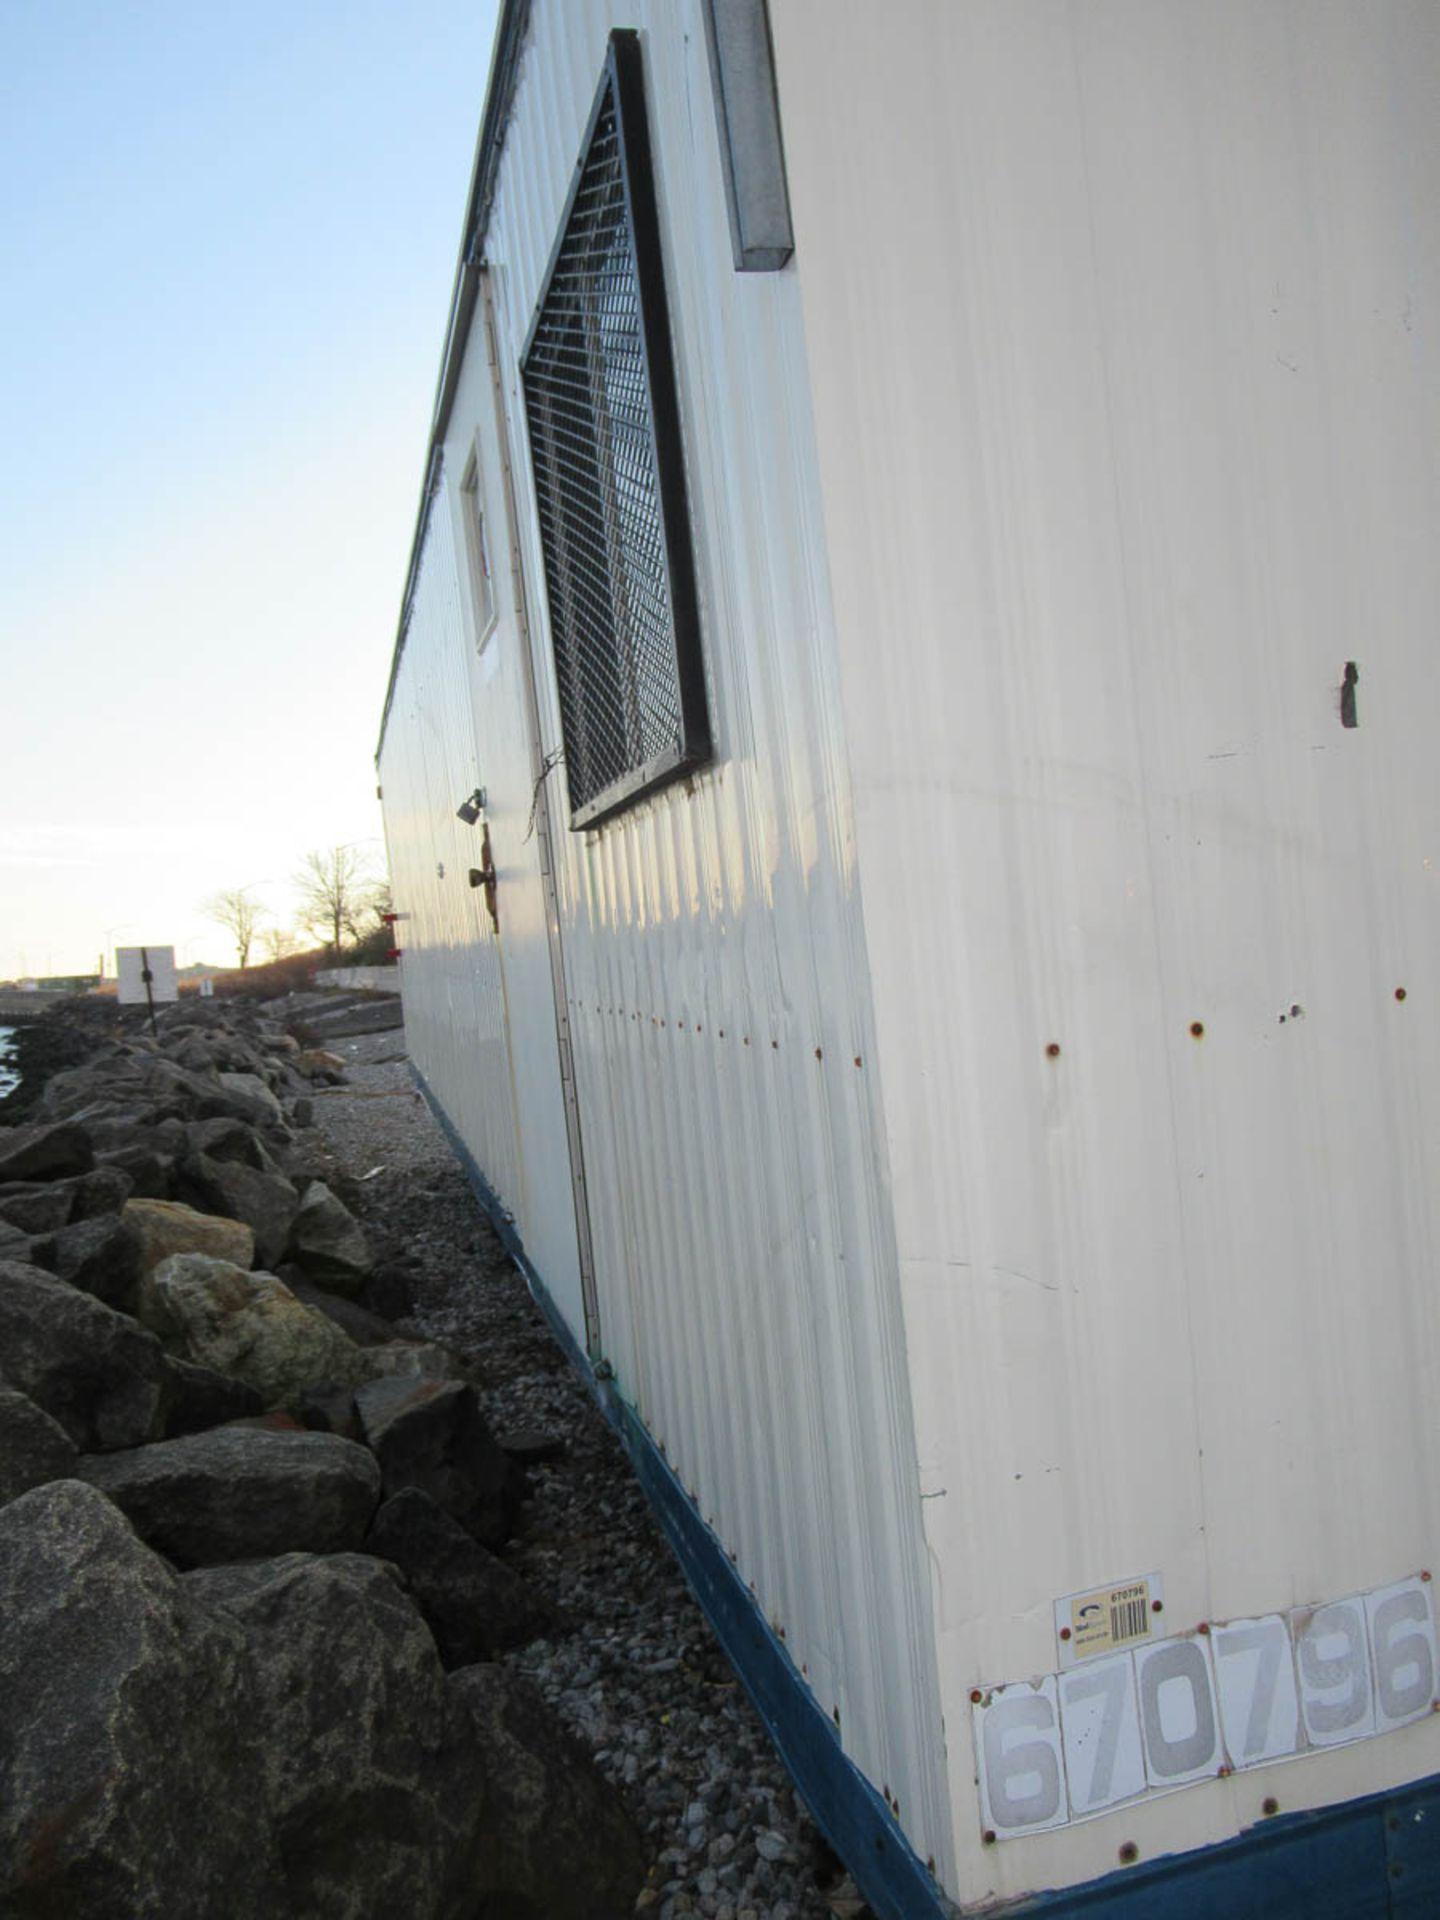 30' OFFICE TRAILER [LOCATED @ MARINE PARKWAY BRIDGE - QUEENS SIDE] - Image 3 of 8